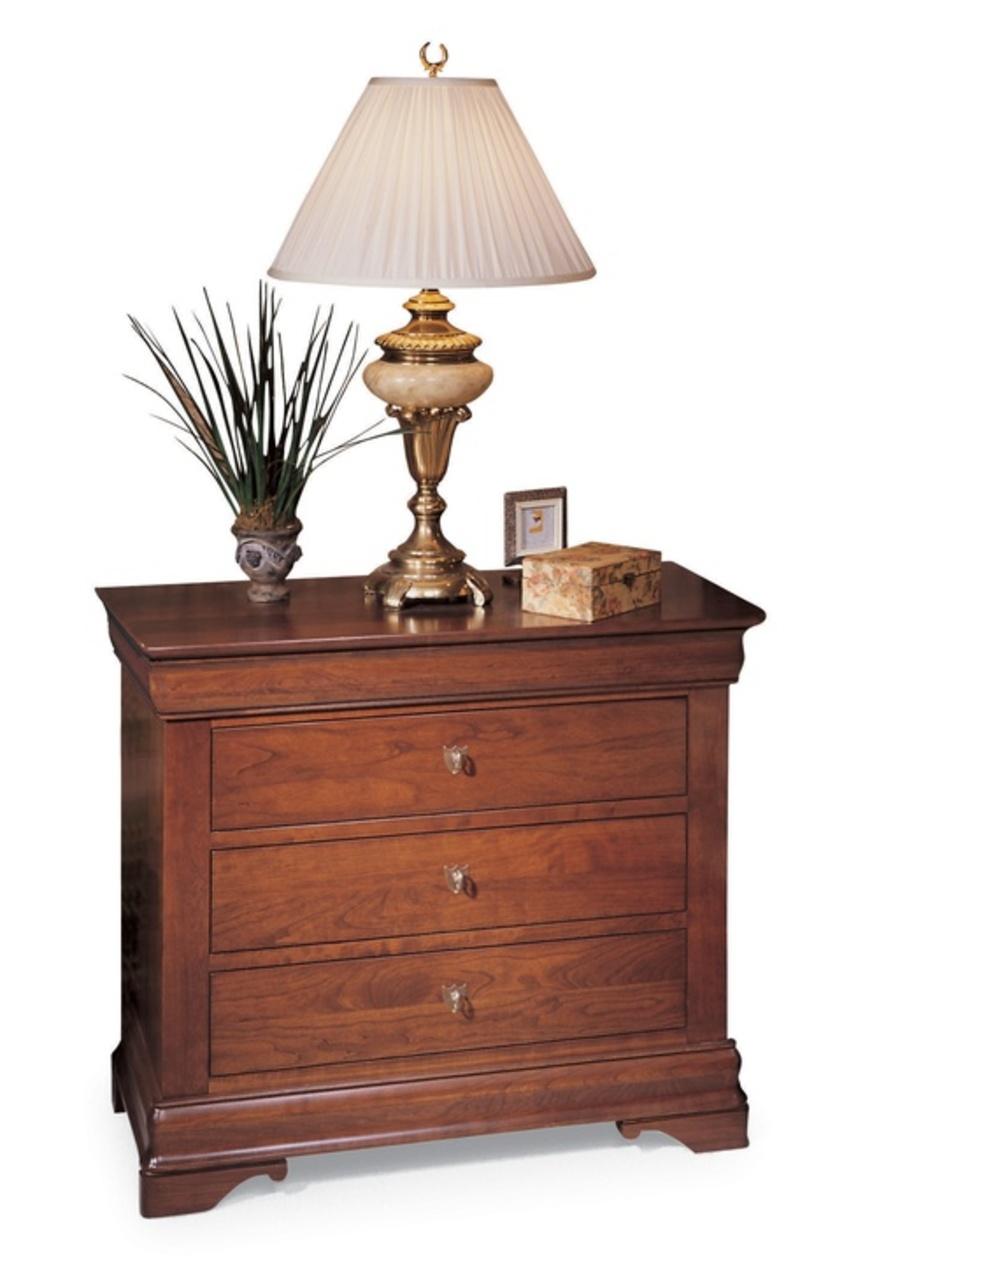 Durham Furniture - Bedside Chest